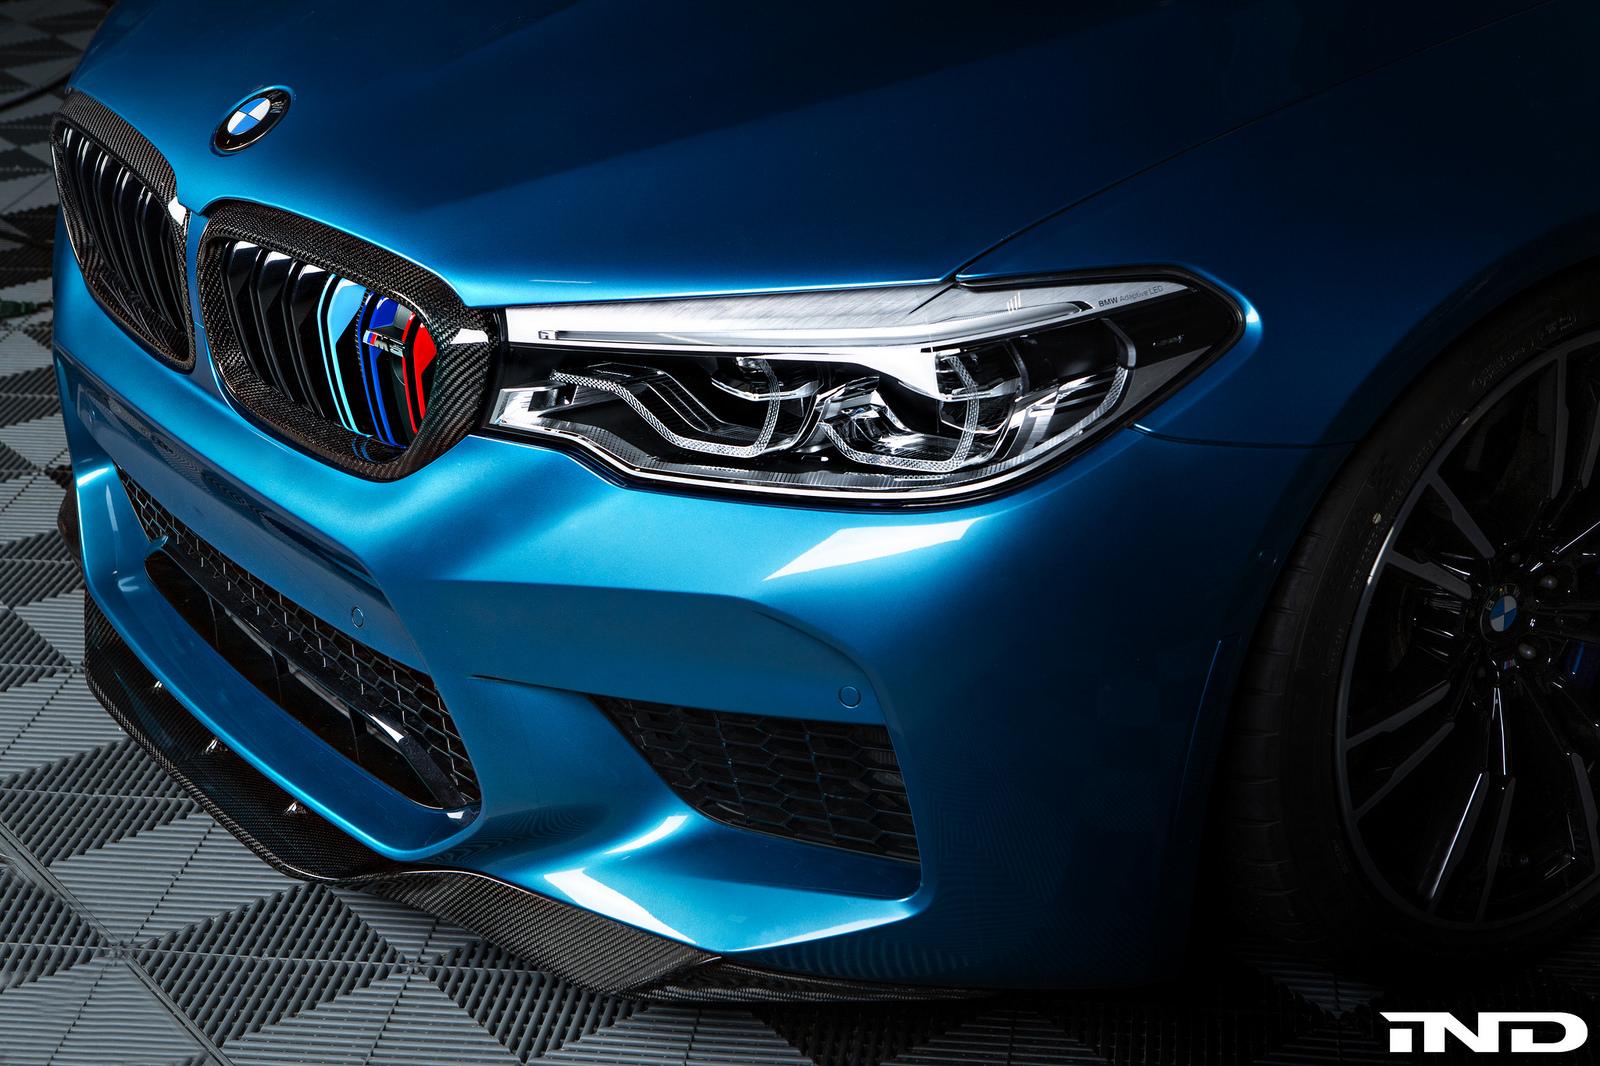 RKP Front lip installed on F90 M5 - M5POST - BMW M5 Forum - F90